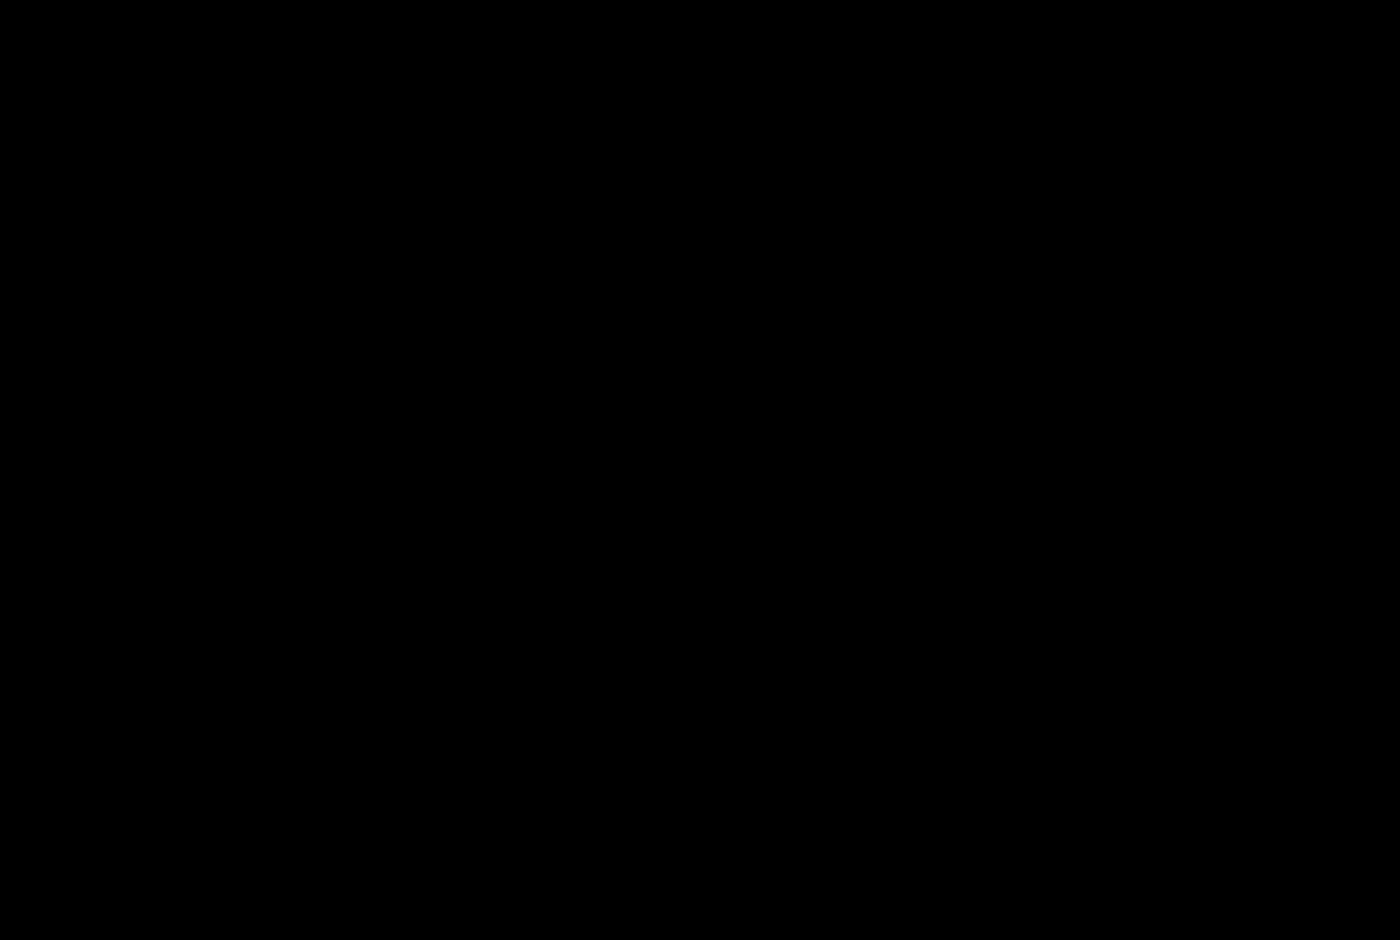 bauhaus-arkadenoptik-erker-grundriss-eg